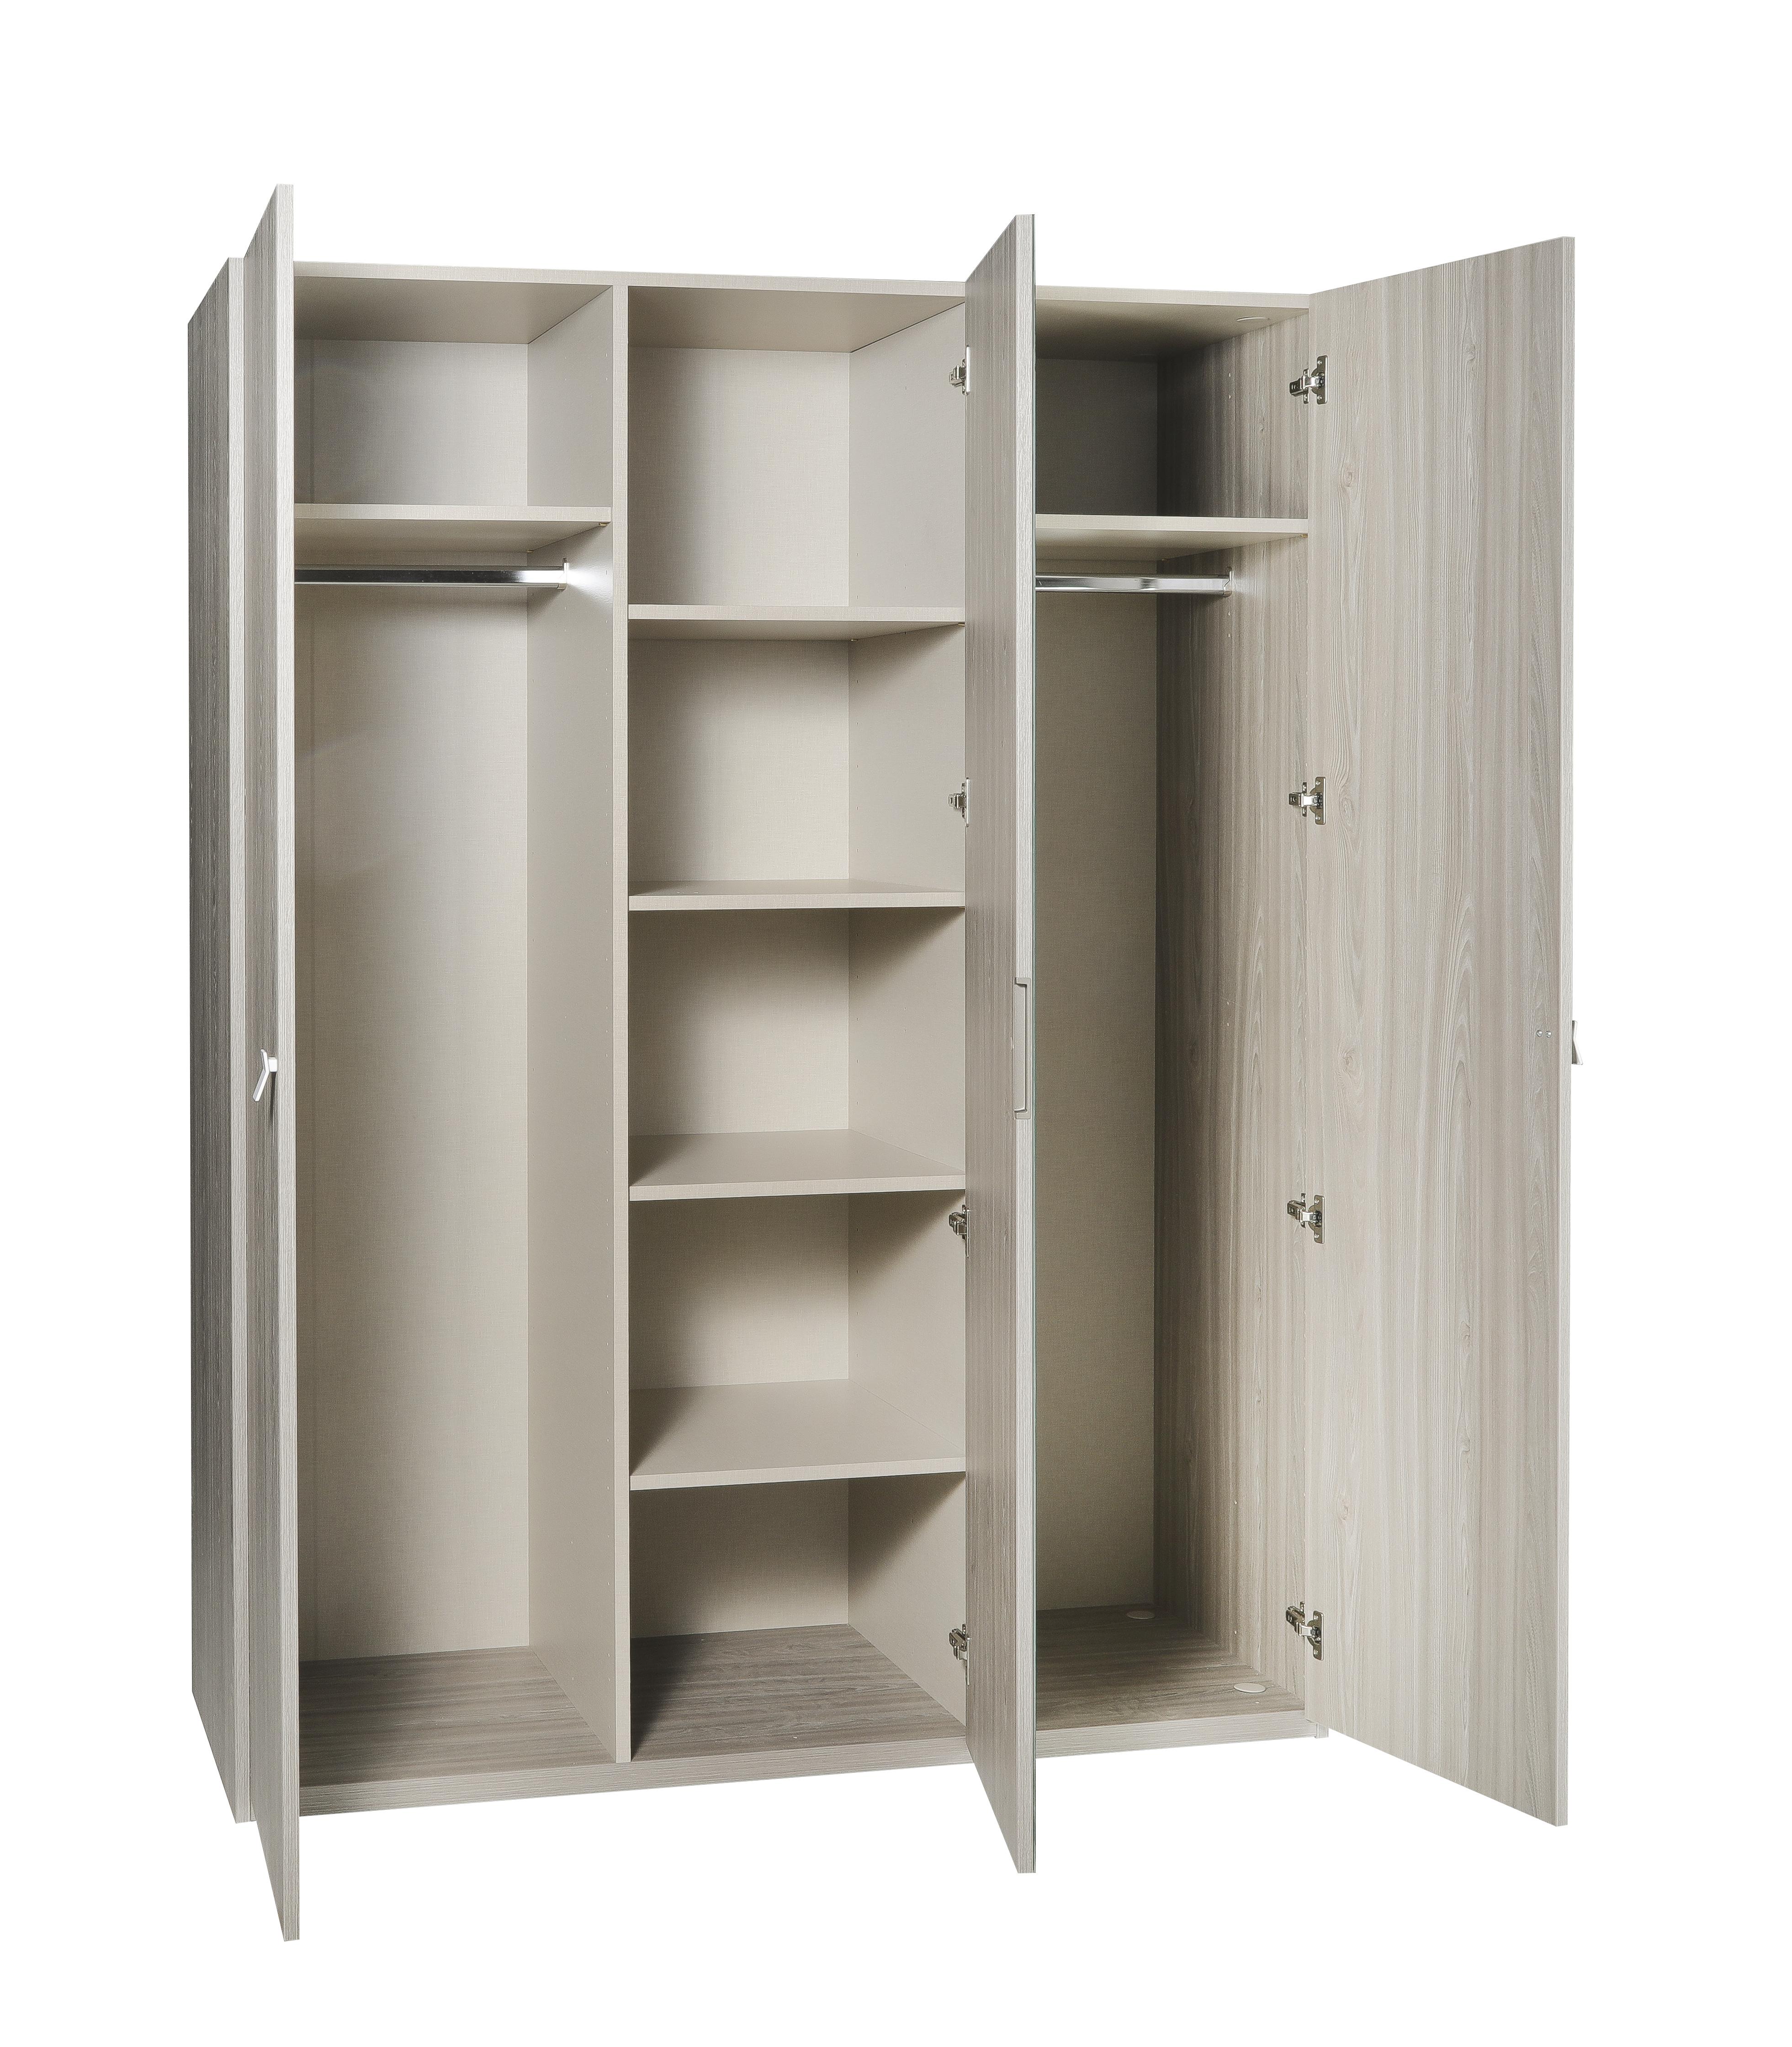 armoire 3 portes pleines battantes collection miami. Black Bedroom Furniture Sets. Home Design Ideas